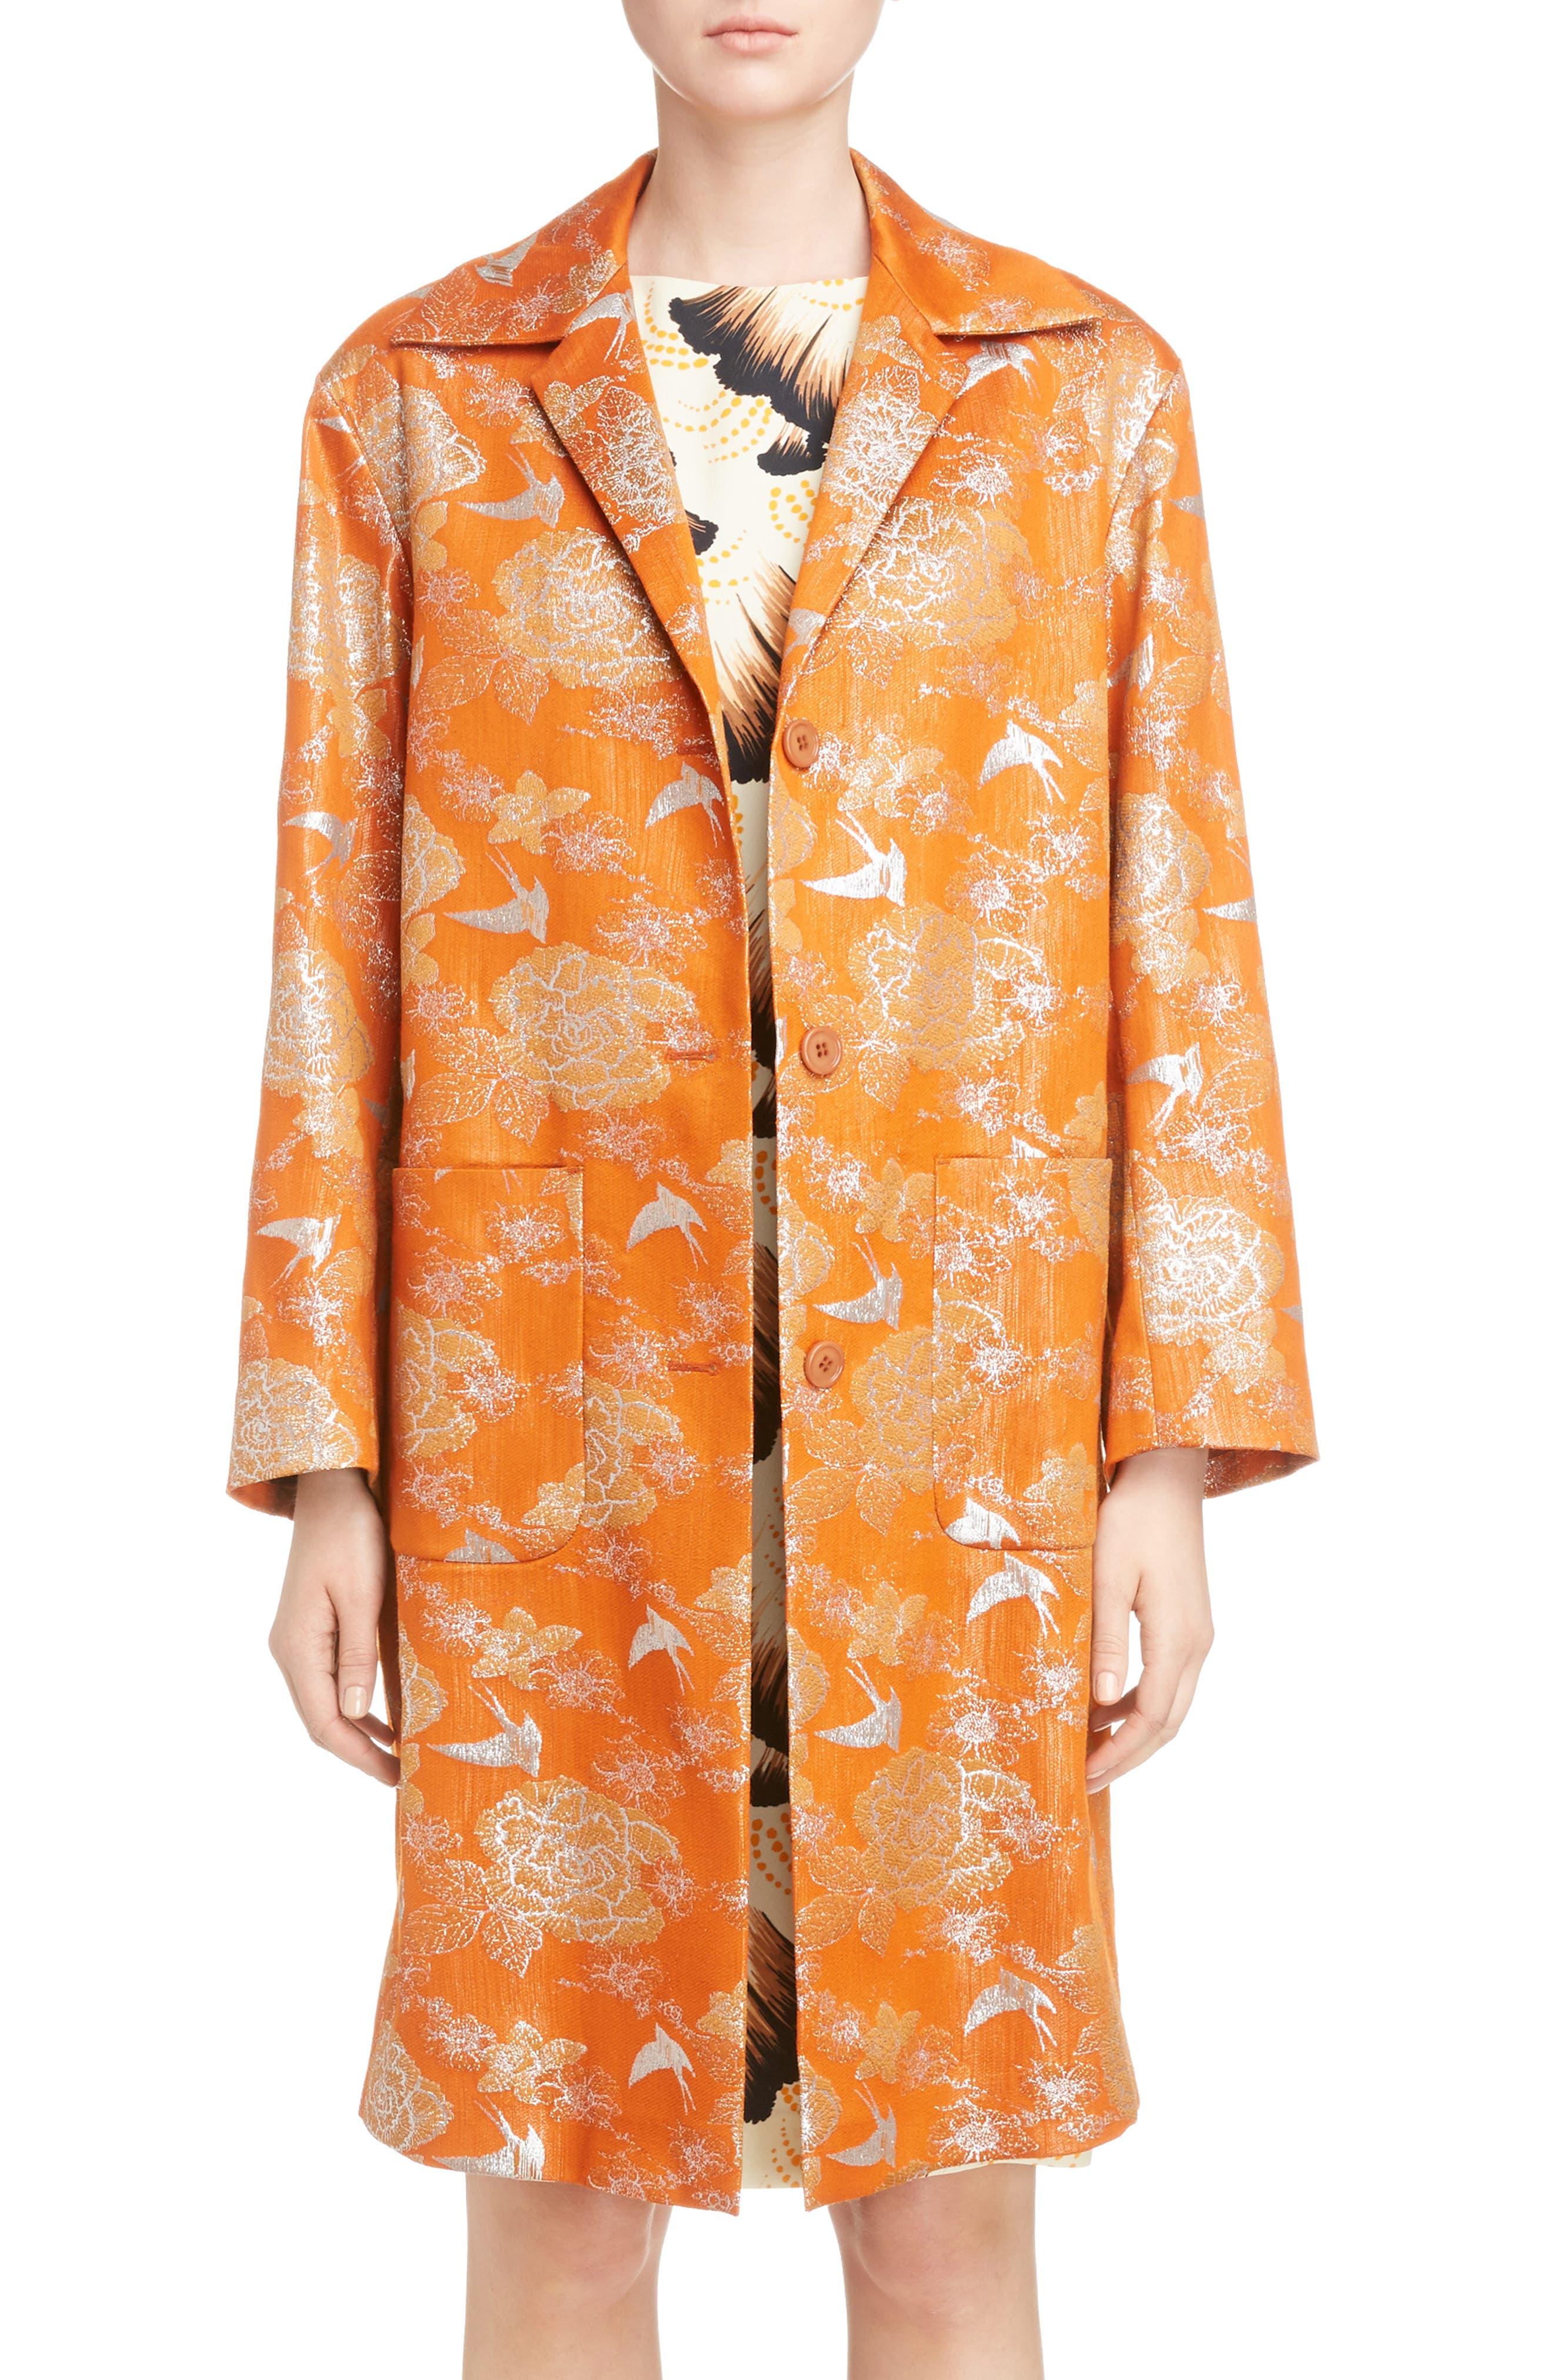 Silver Bird Jacquard Coat,                             Main thumbnail 1, color,                             Orange